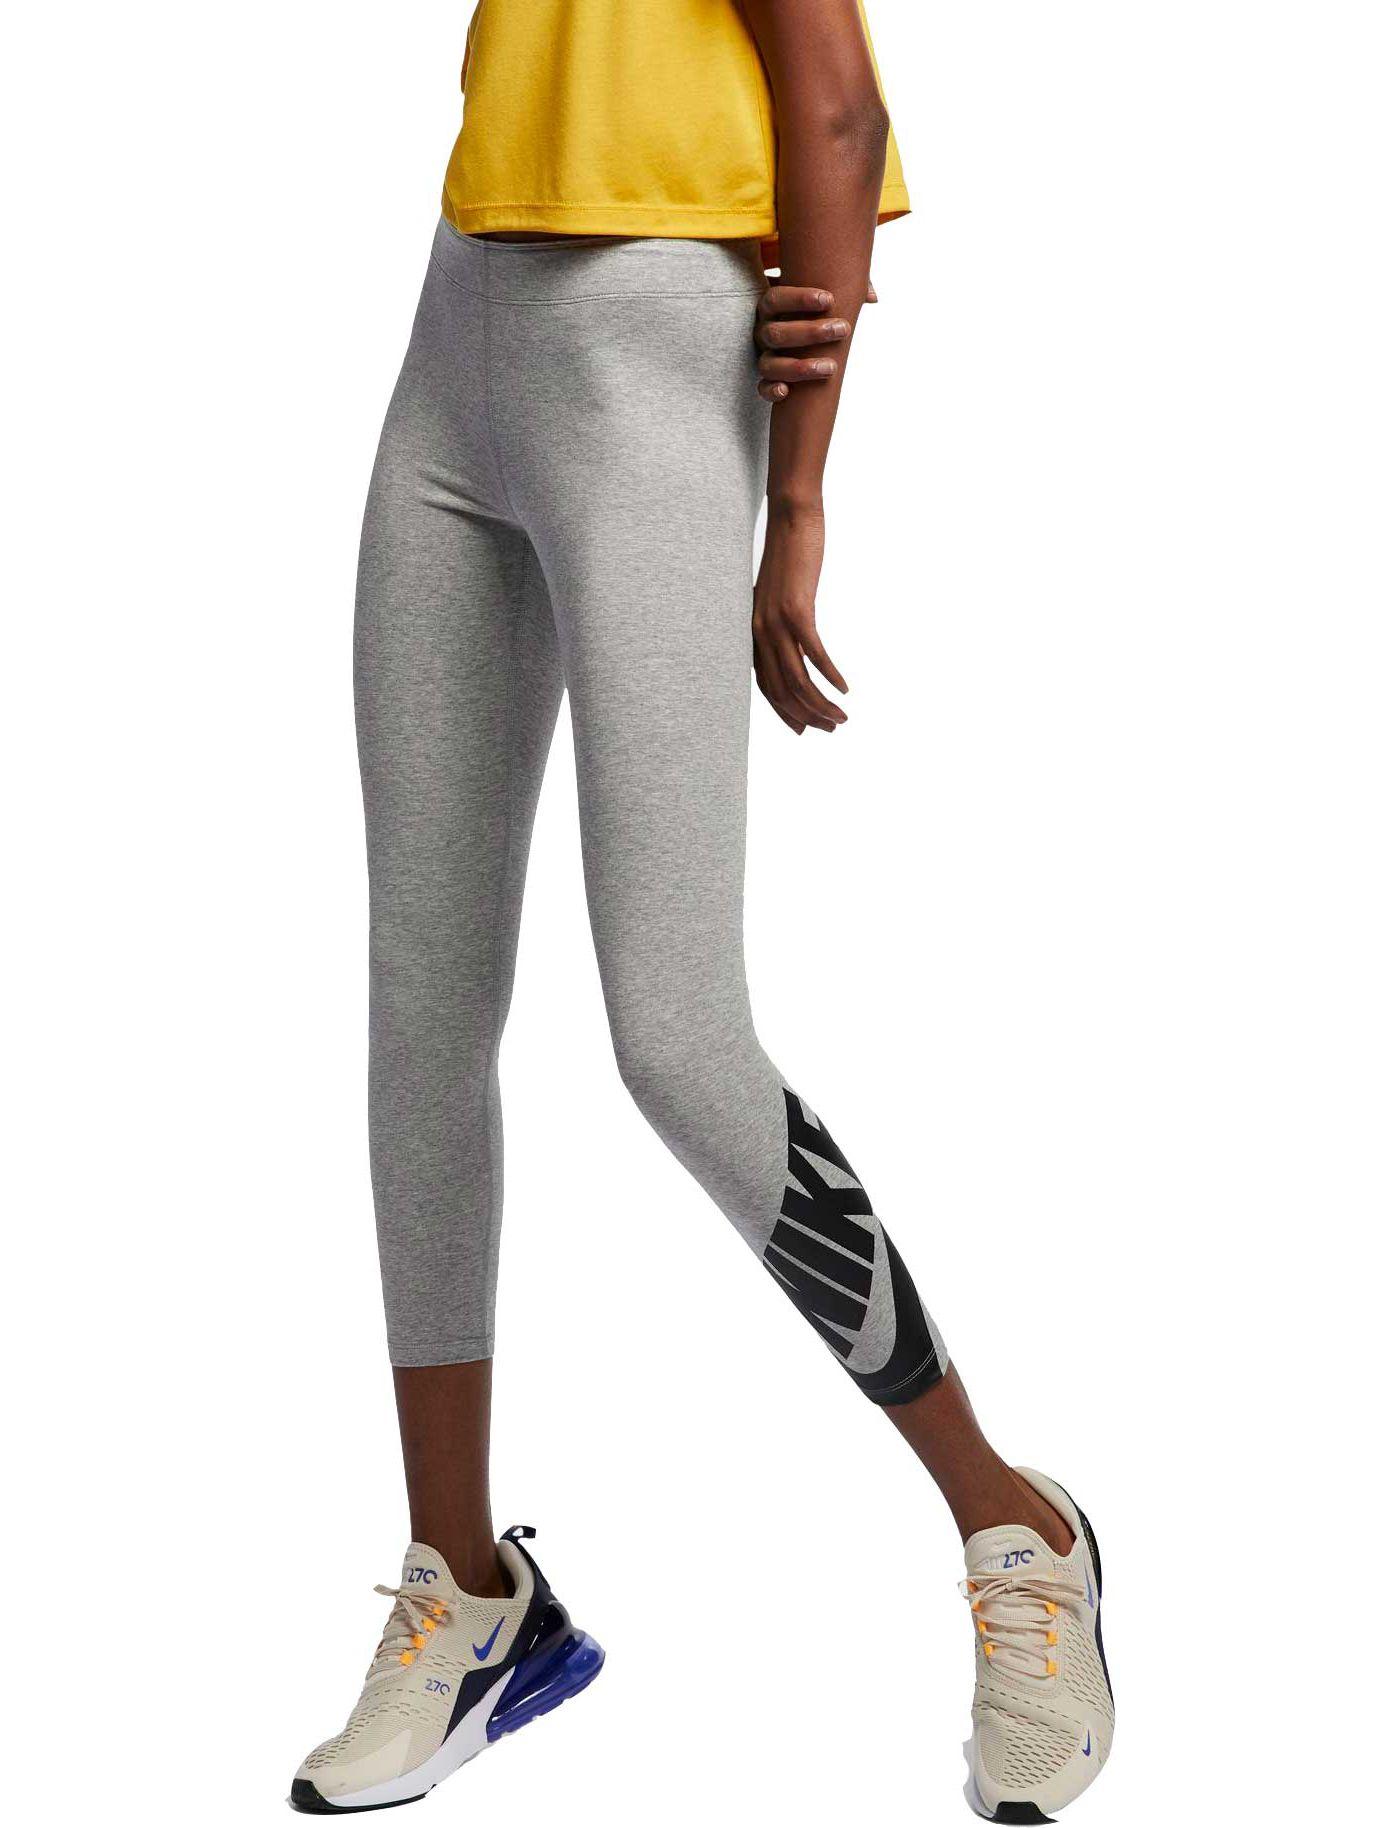 Nike Women's Leg-A-See 7/8 Leggings